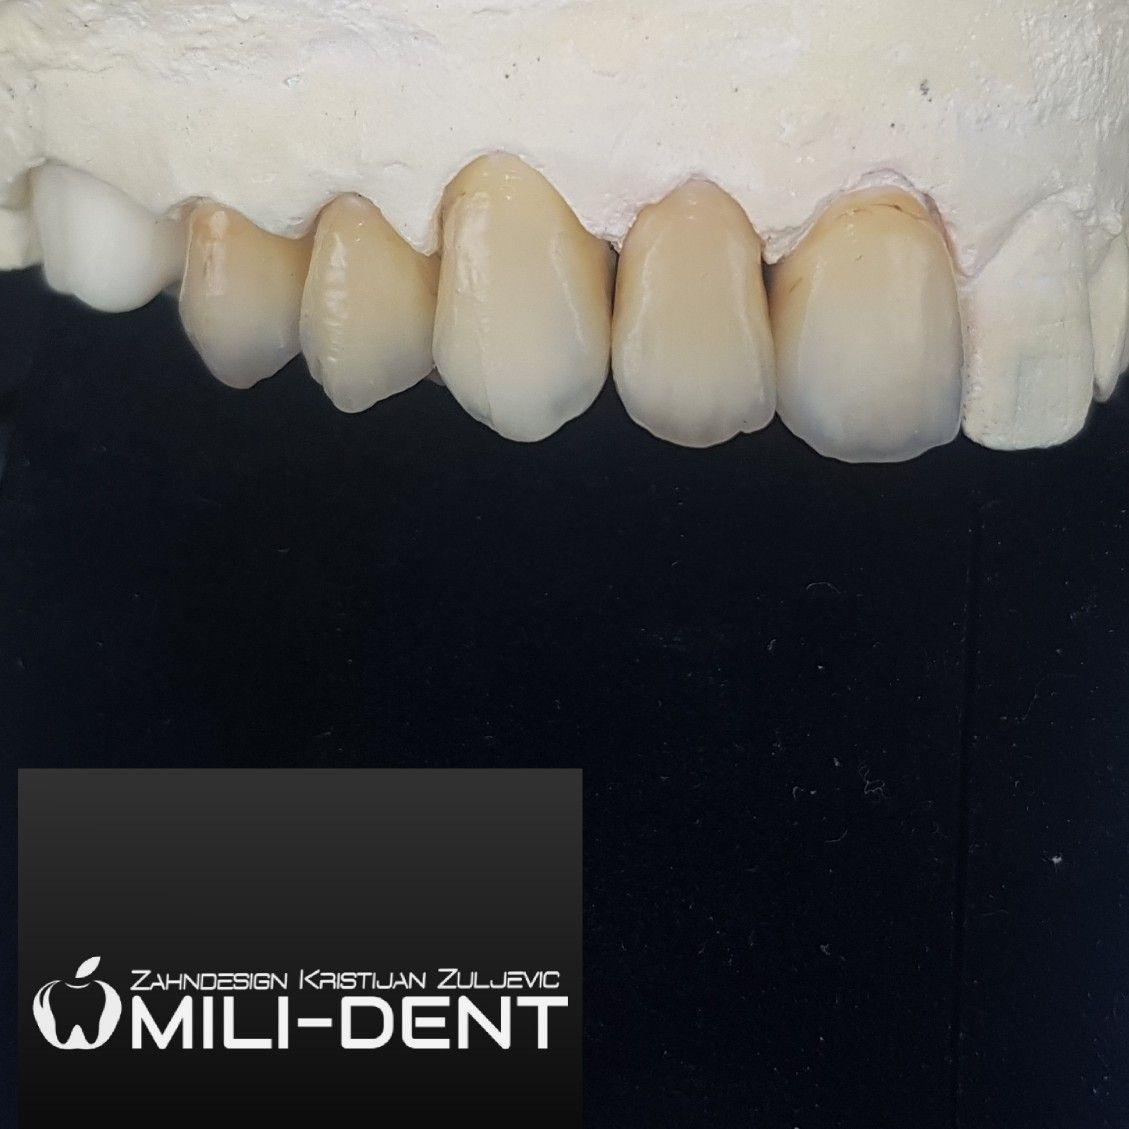 Pin By Gergely Visnyei On Zahndesign Mili Dent Dental Vienna Dental Dentistry Dental Ceramics